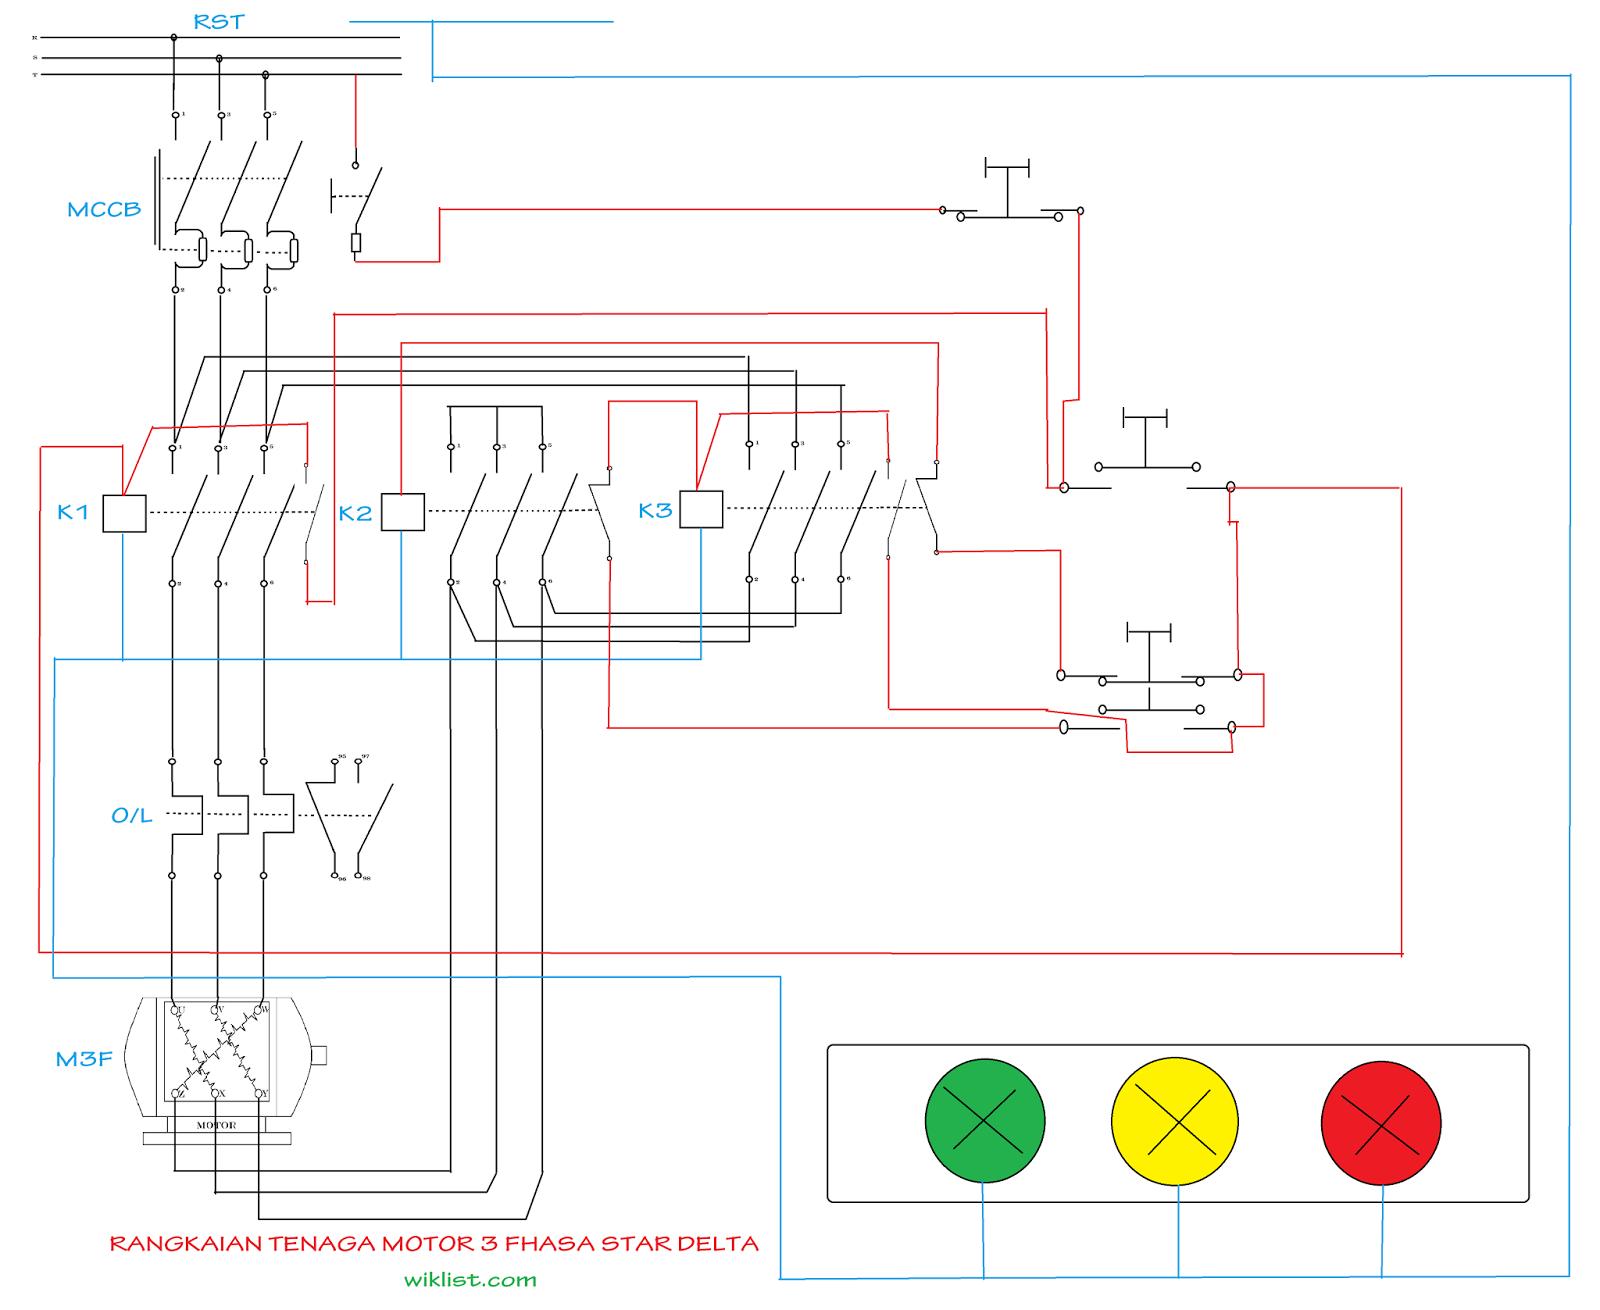 Wondrous Sistem Kontrol Motor Listrik 3 Phasa Star Delta Mebuat Dan Wiring Digital Resources Honesemecshebarightsorg